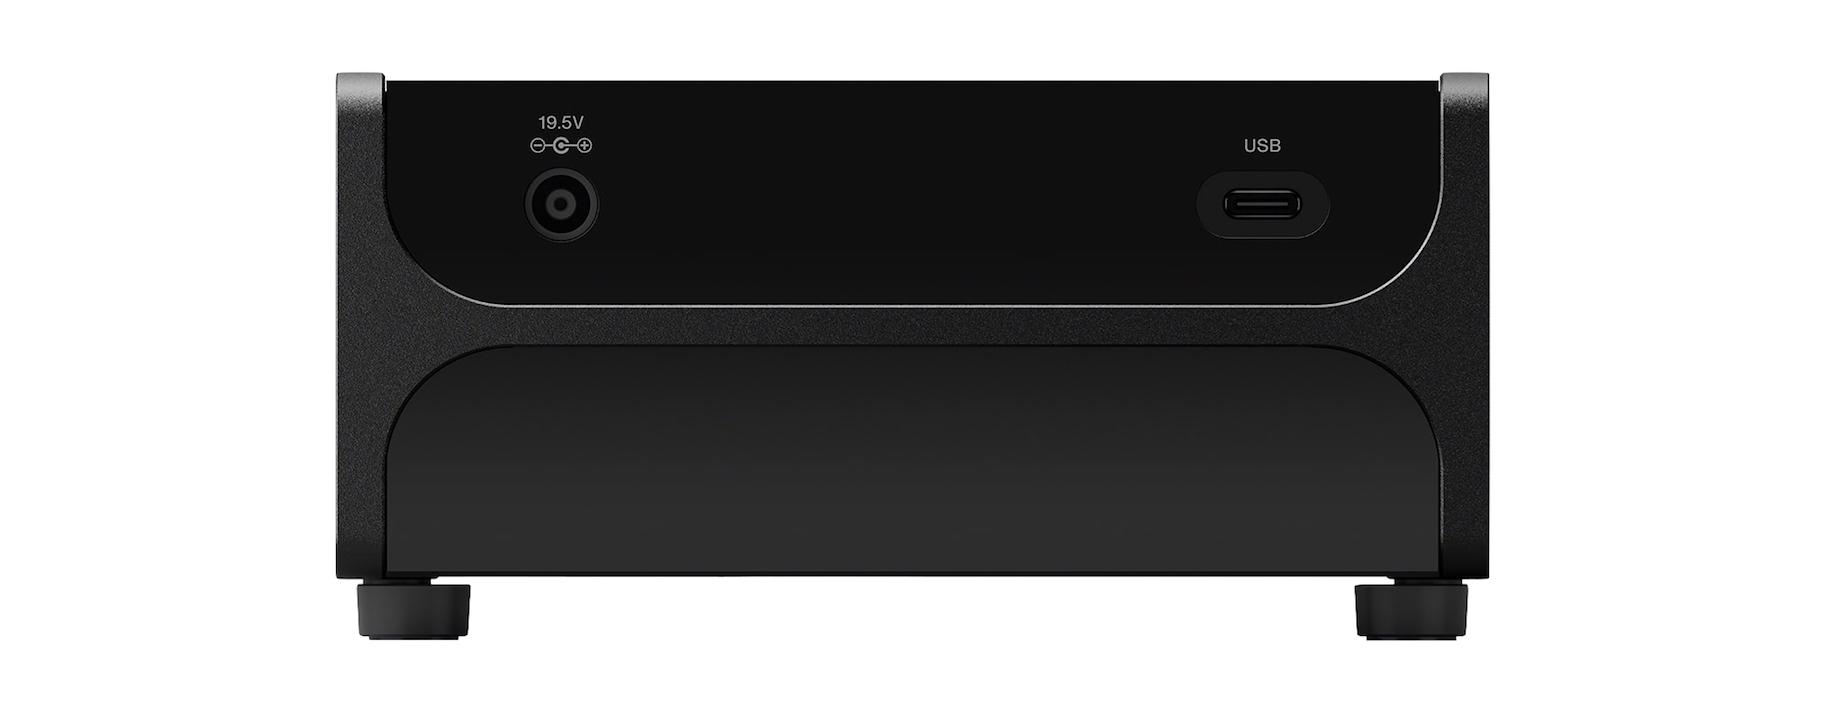 sony-dmp-z1-music-player-back-panel-audiophile-music-player-headfi-pentaconn-fully-balanced-best-dac-usbc